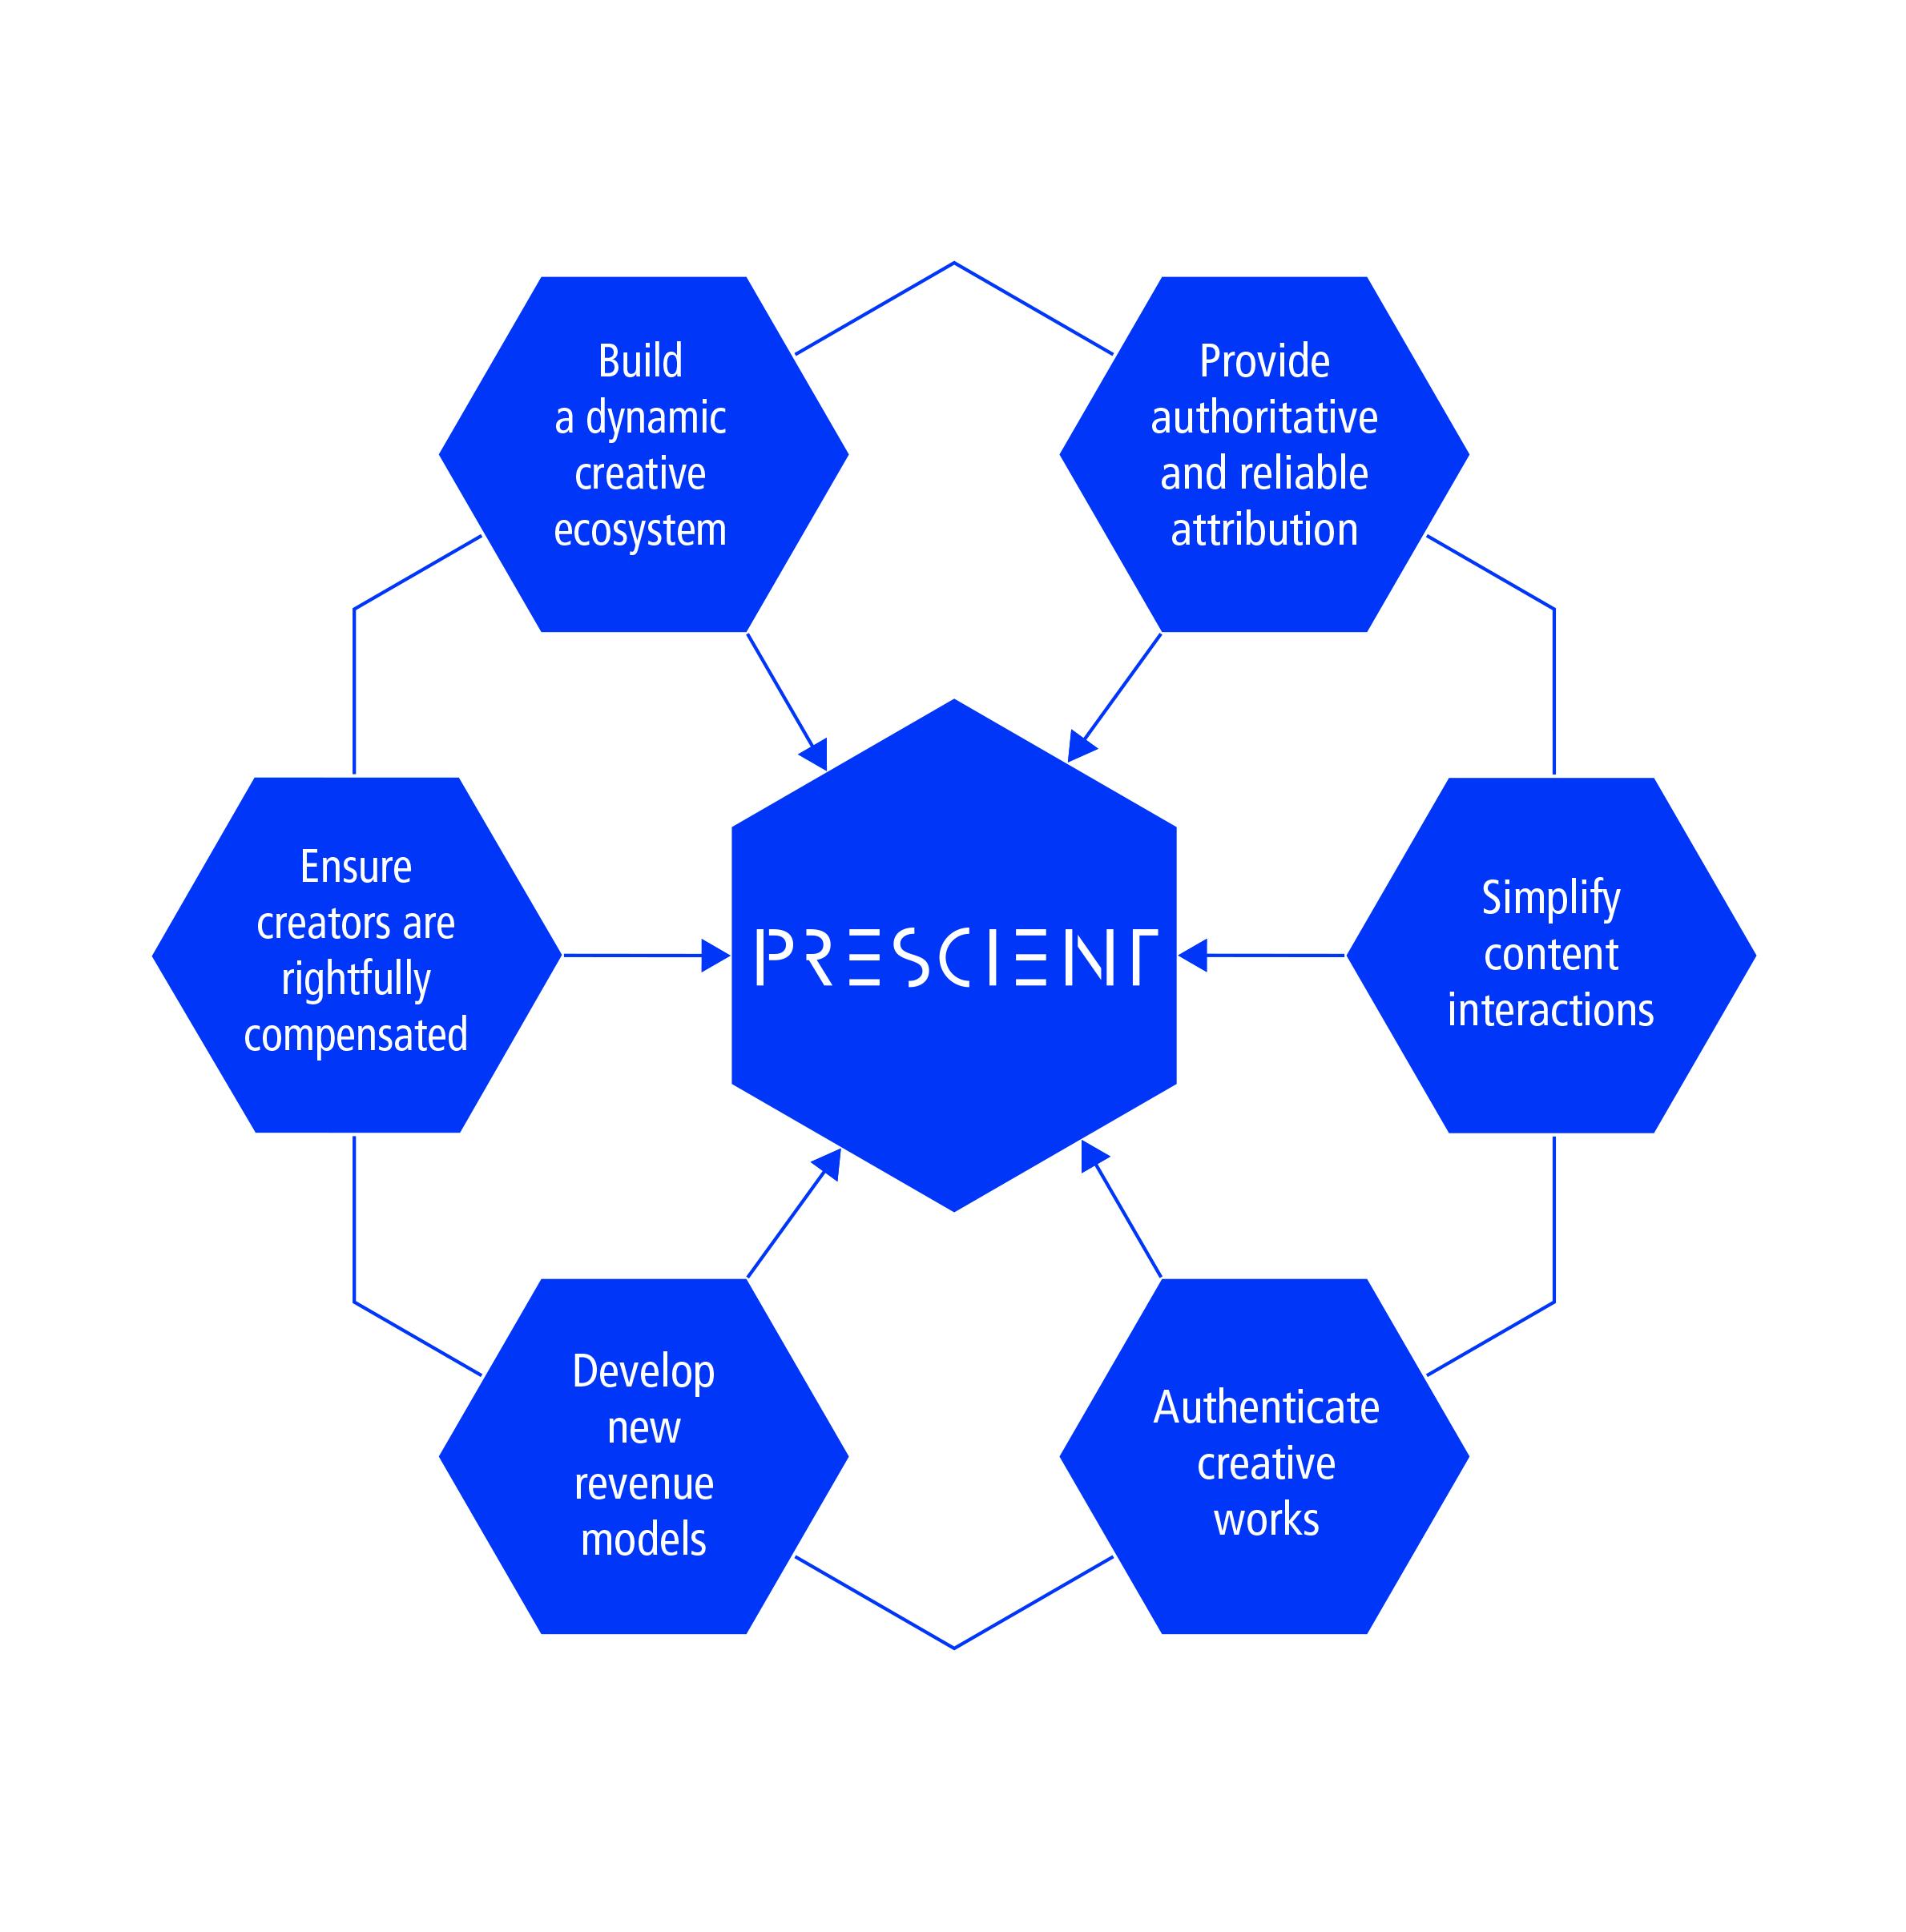 hexagon_illustration_NEW.jpg